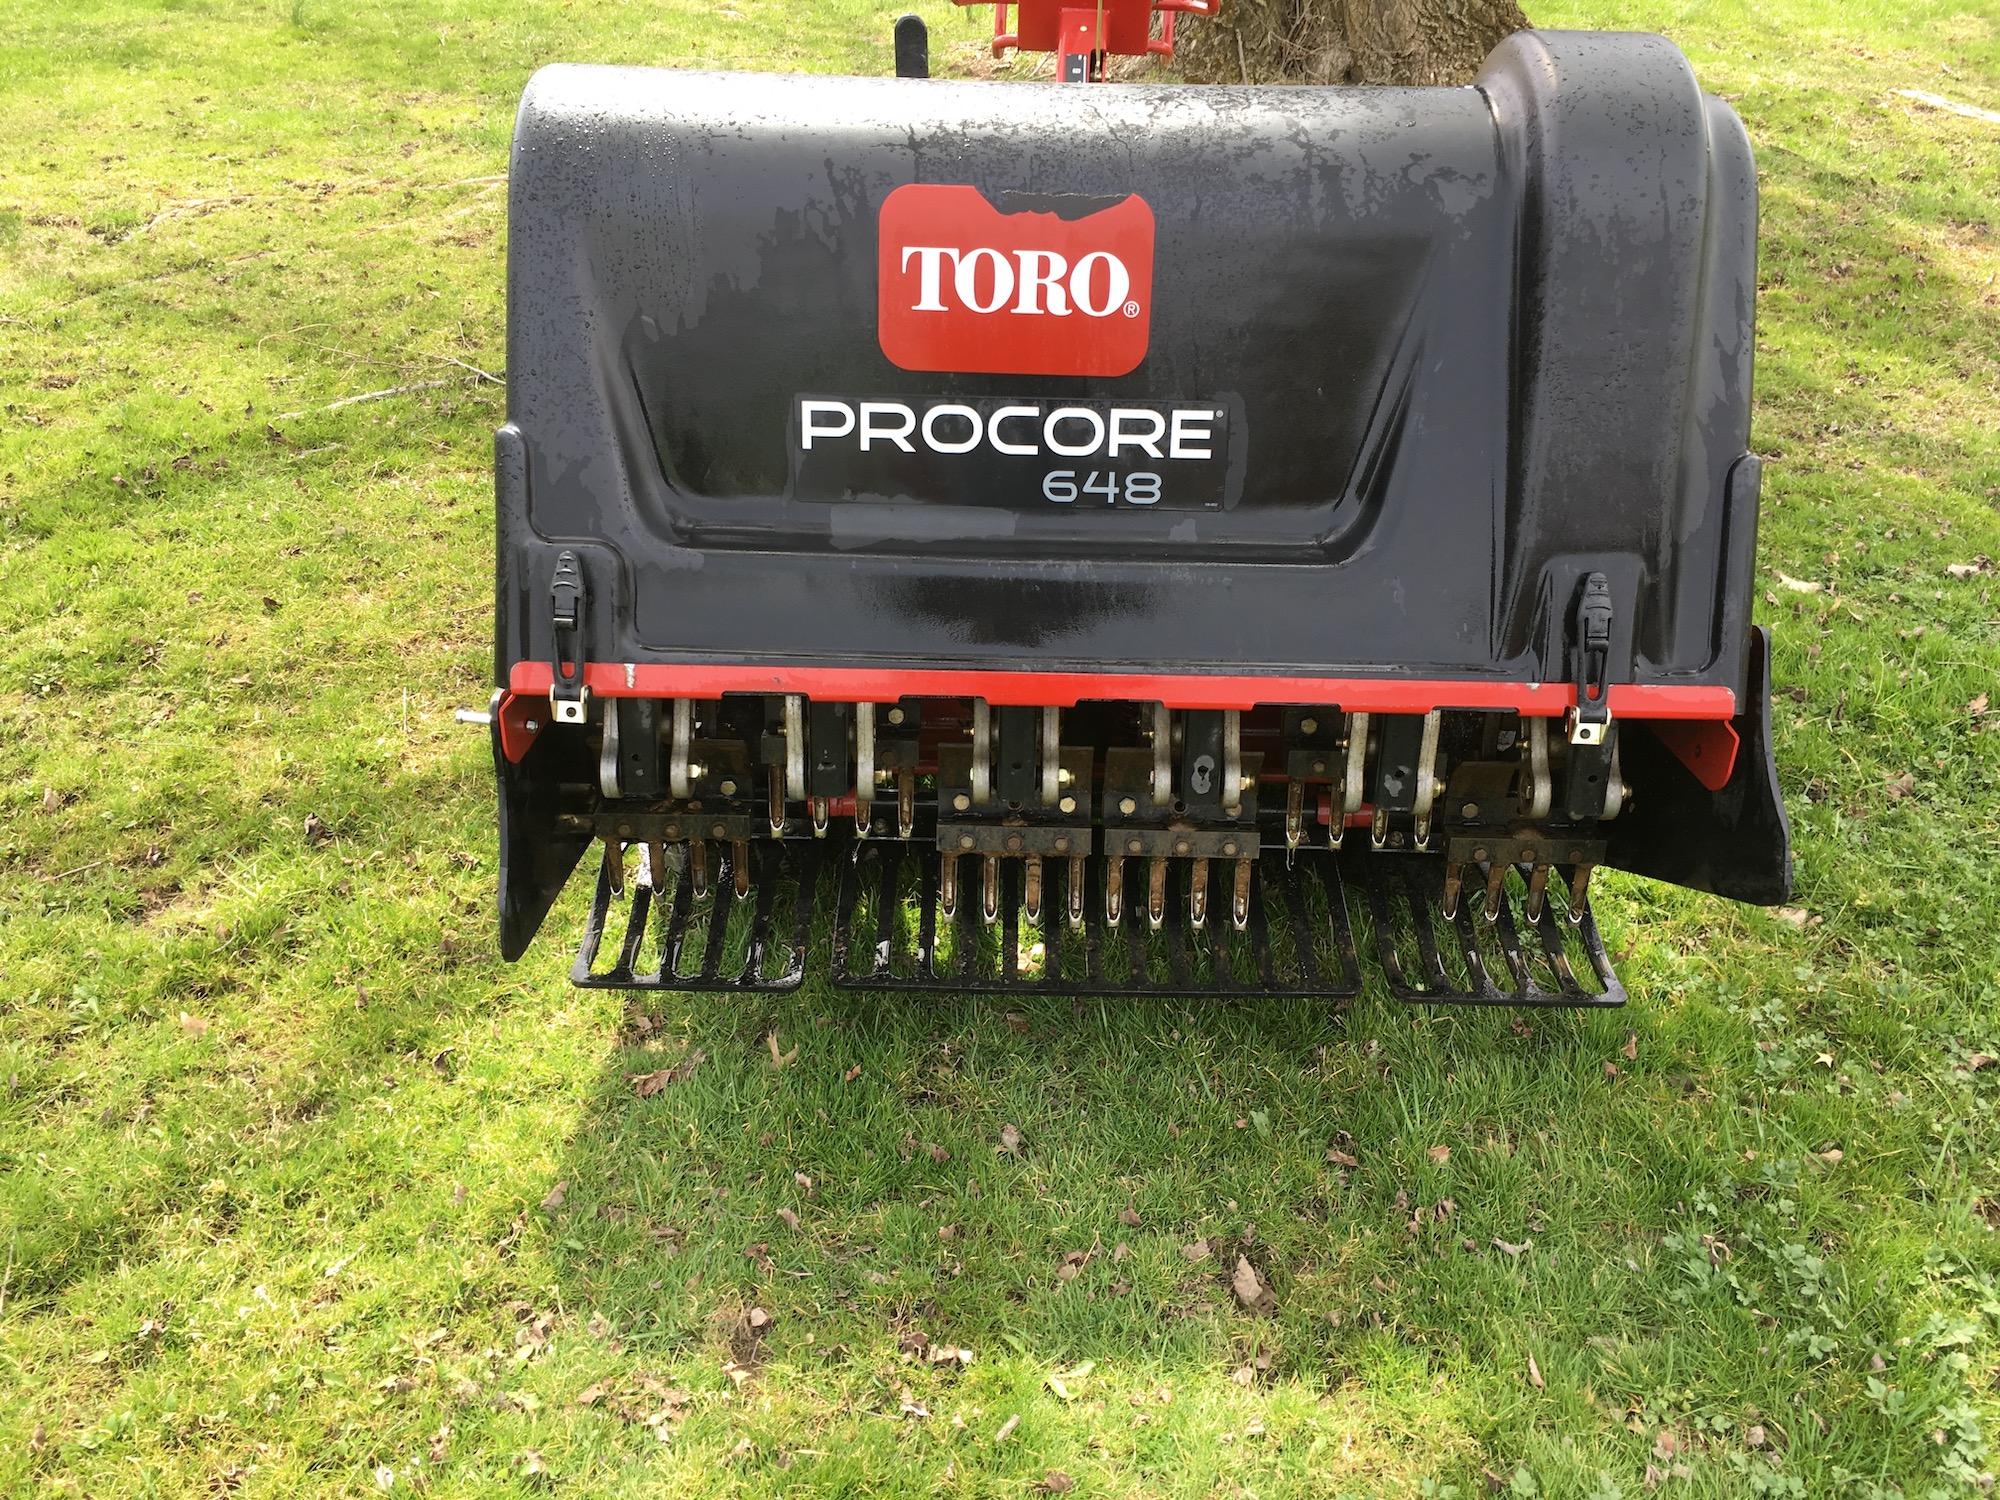 Toro-Procore648-Aerifier-03